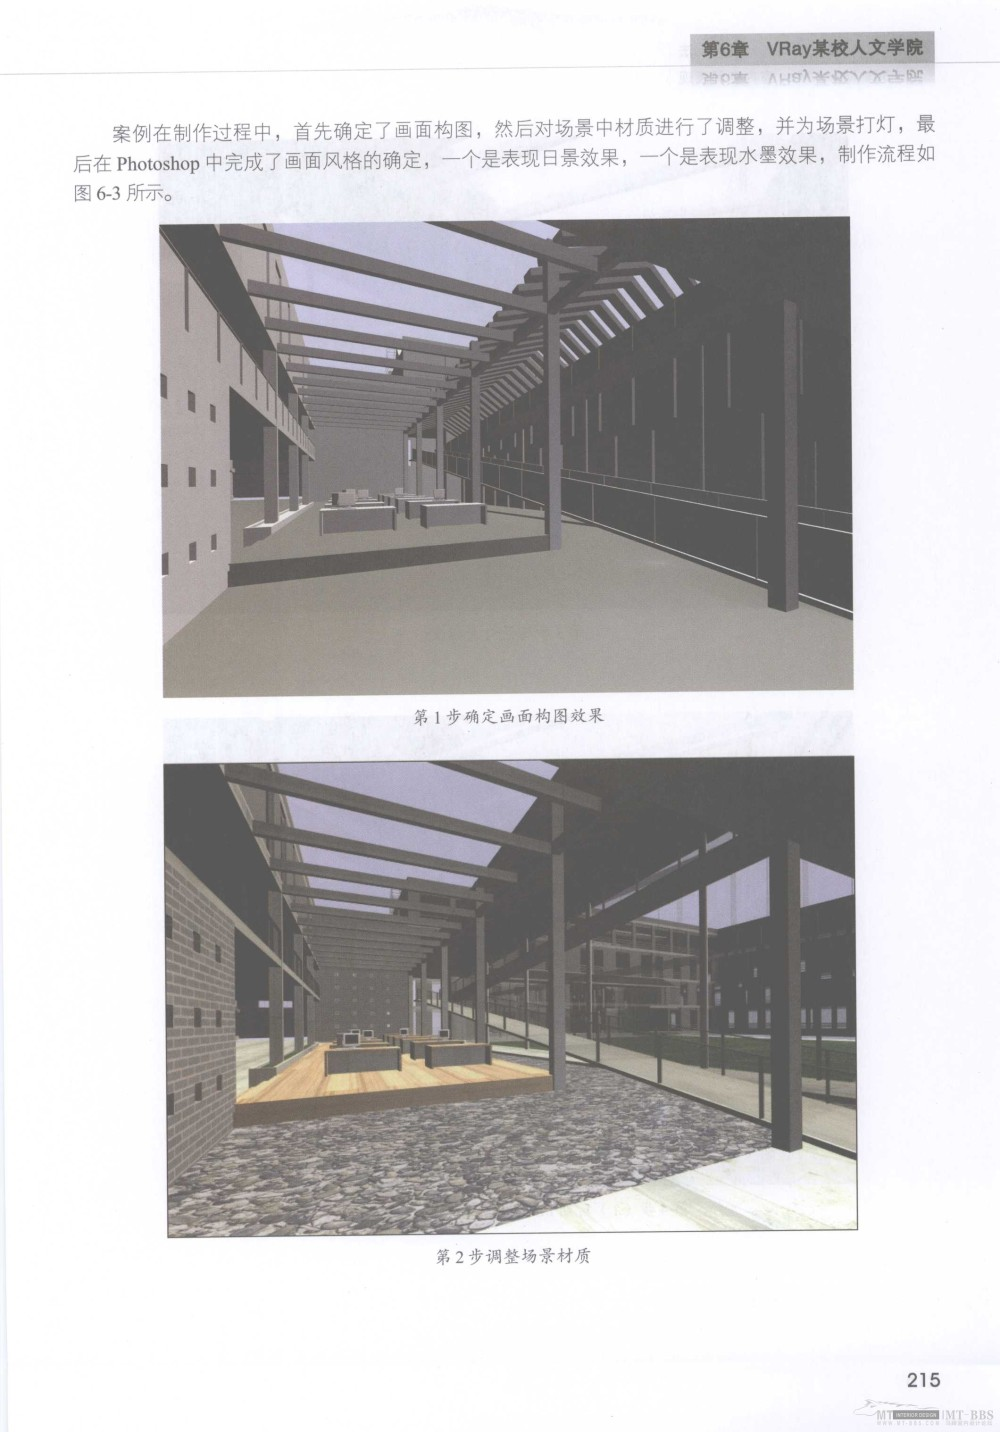 水晶石技法-3ds_Max&VRay室内空间表现_水晶石技法-3ds_Max&VRay室内空间表现_页面_221.jpg